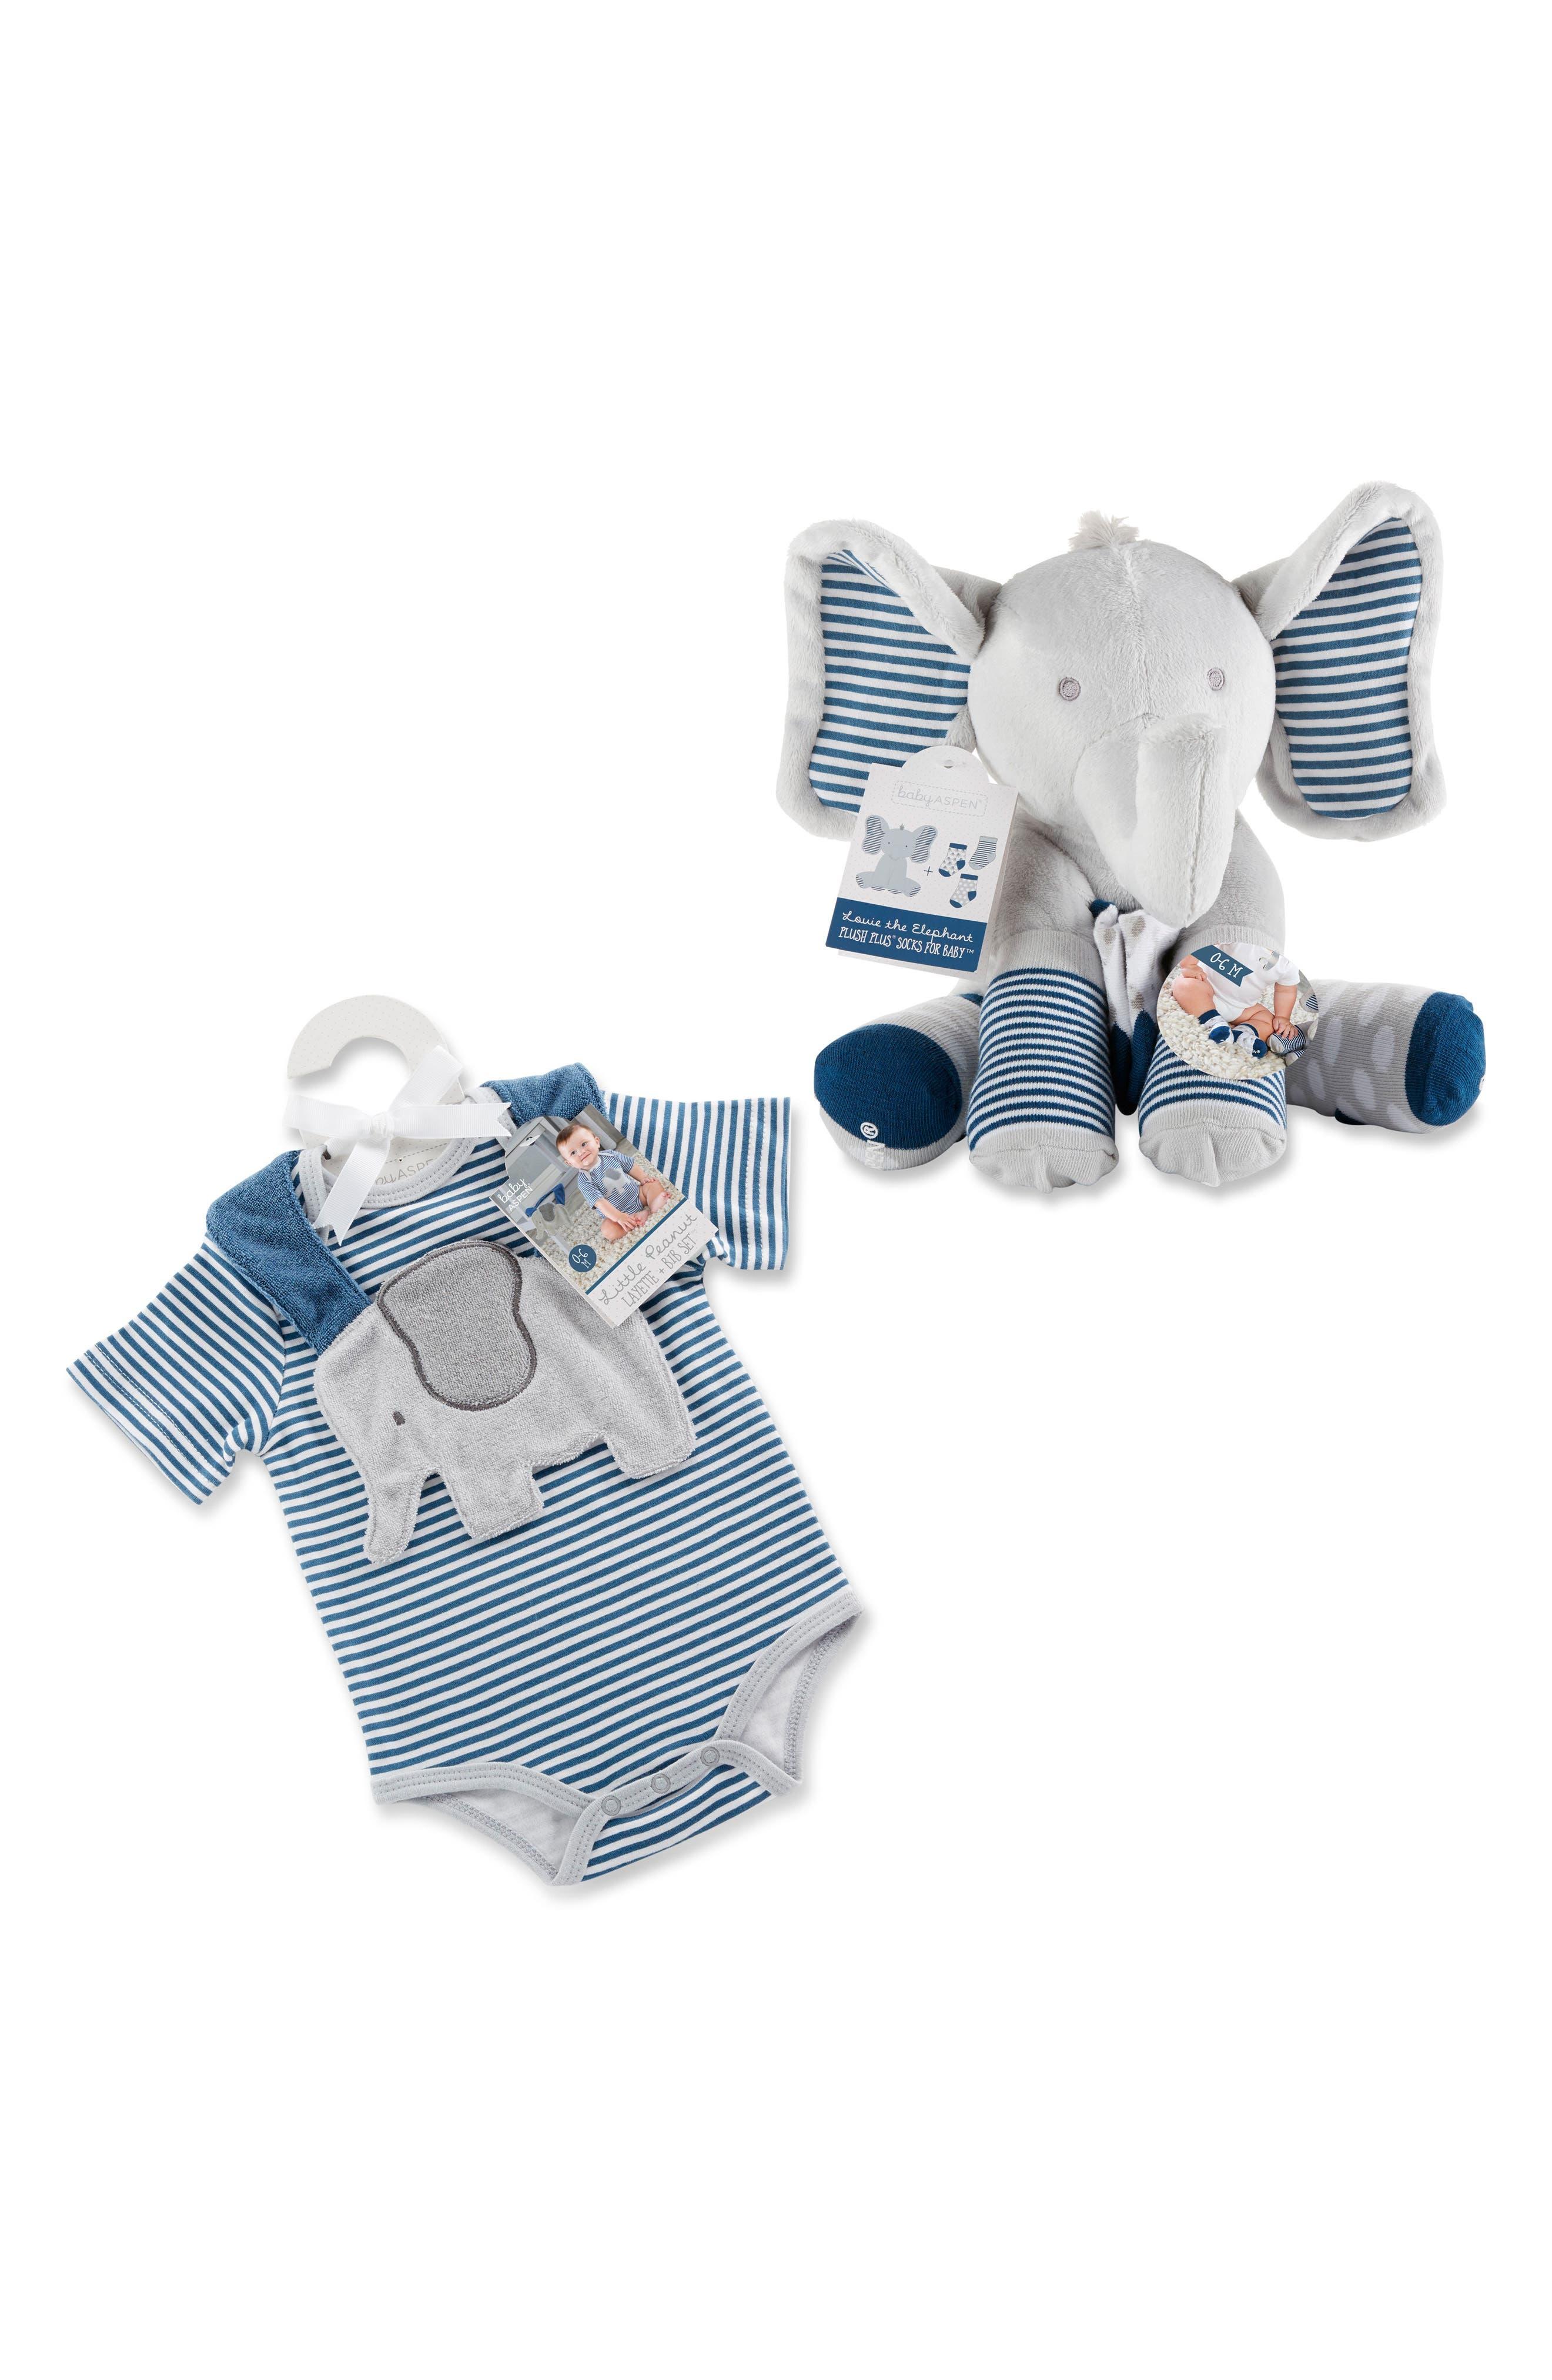 Baby Aspen Little Peanut Elephant Bodysuit, Bib, Socks & Stuffed Animal Set (Baby Boys)